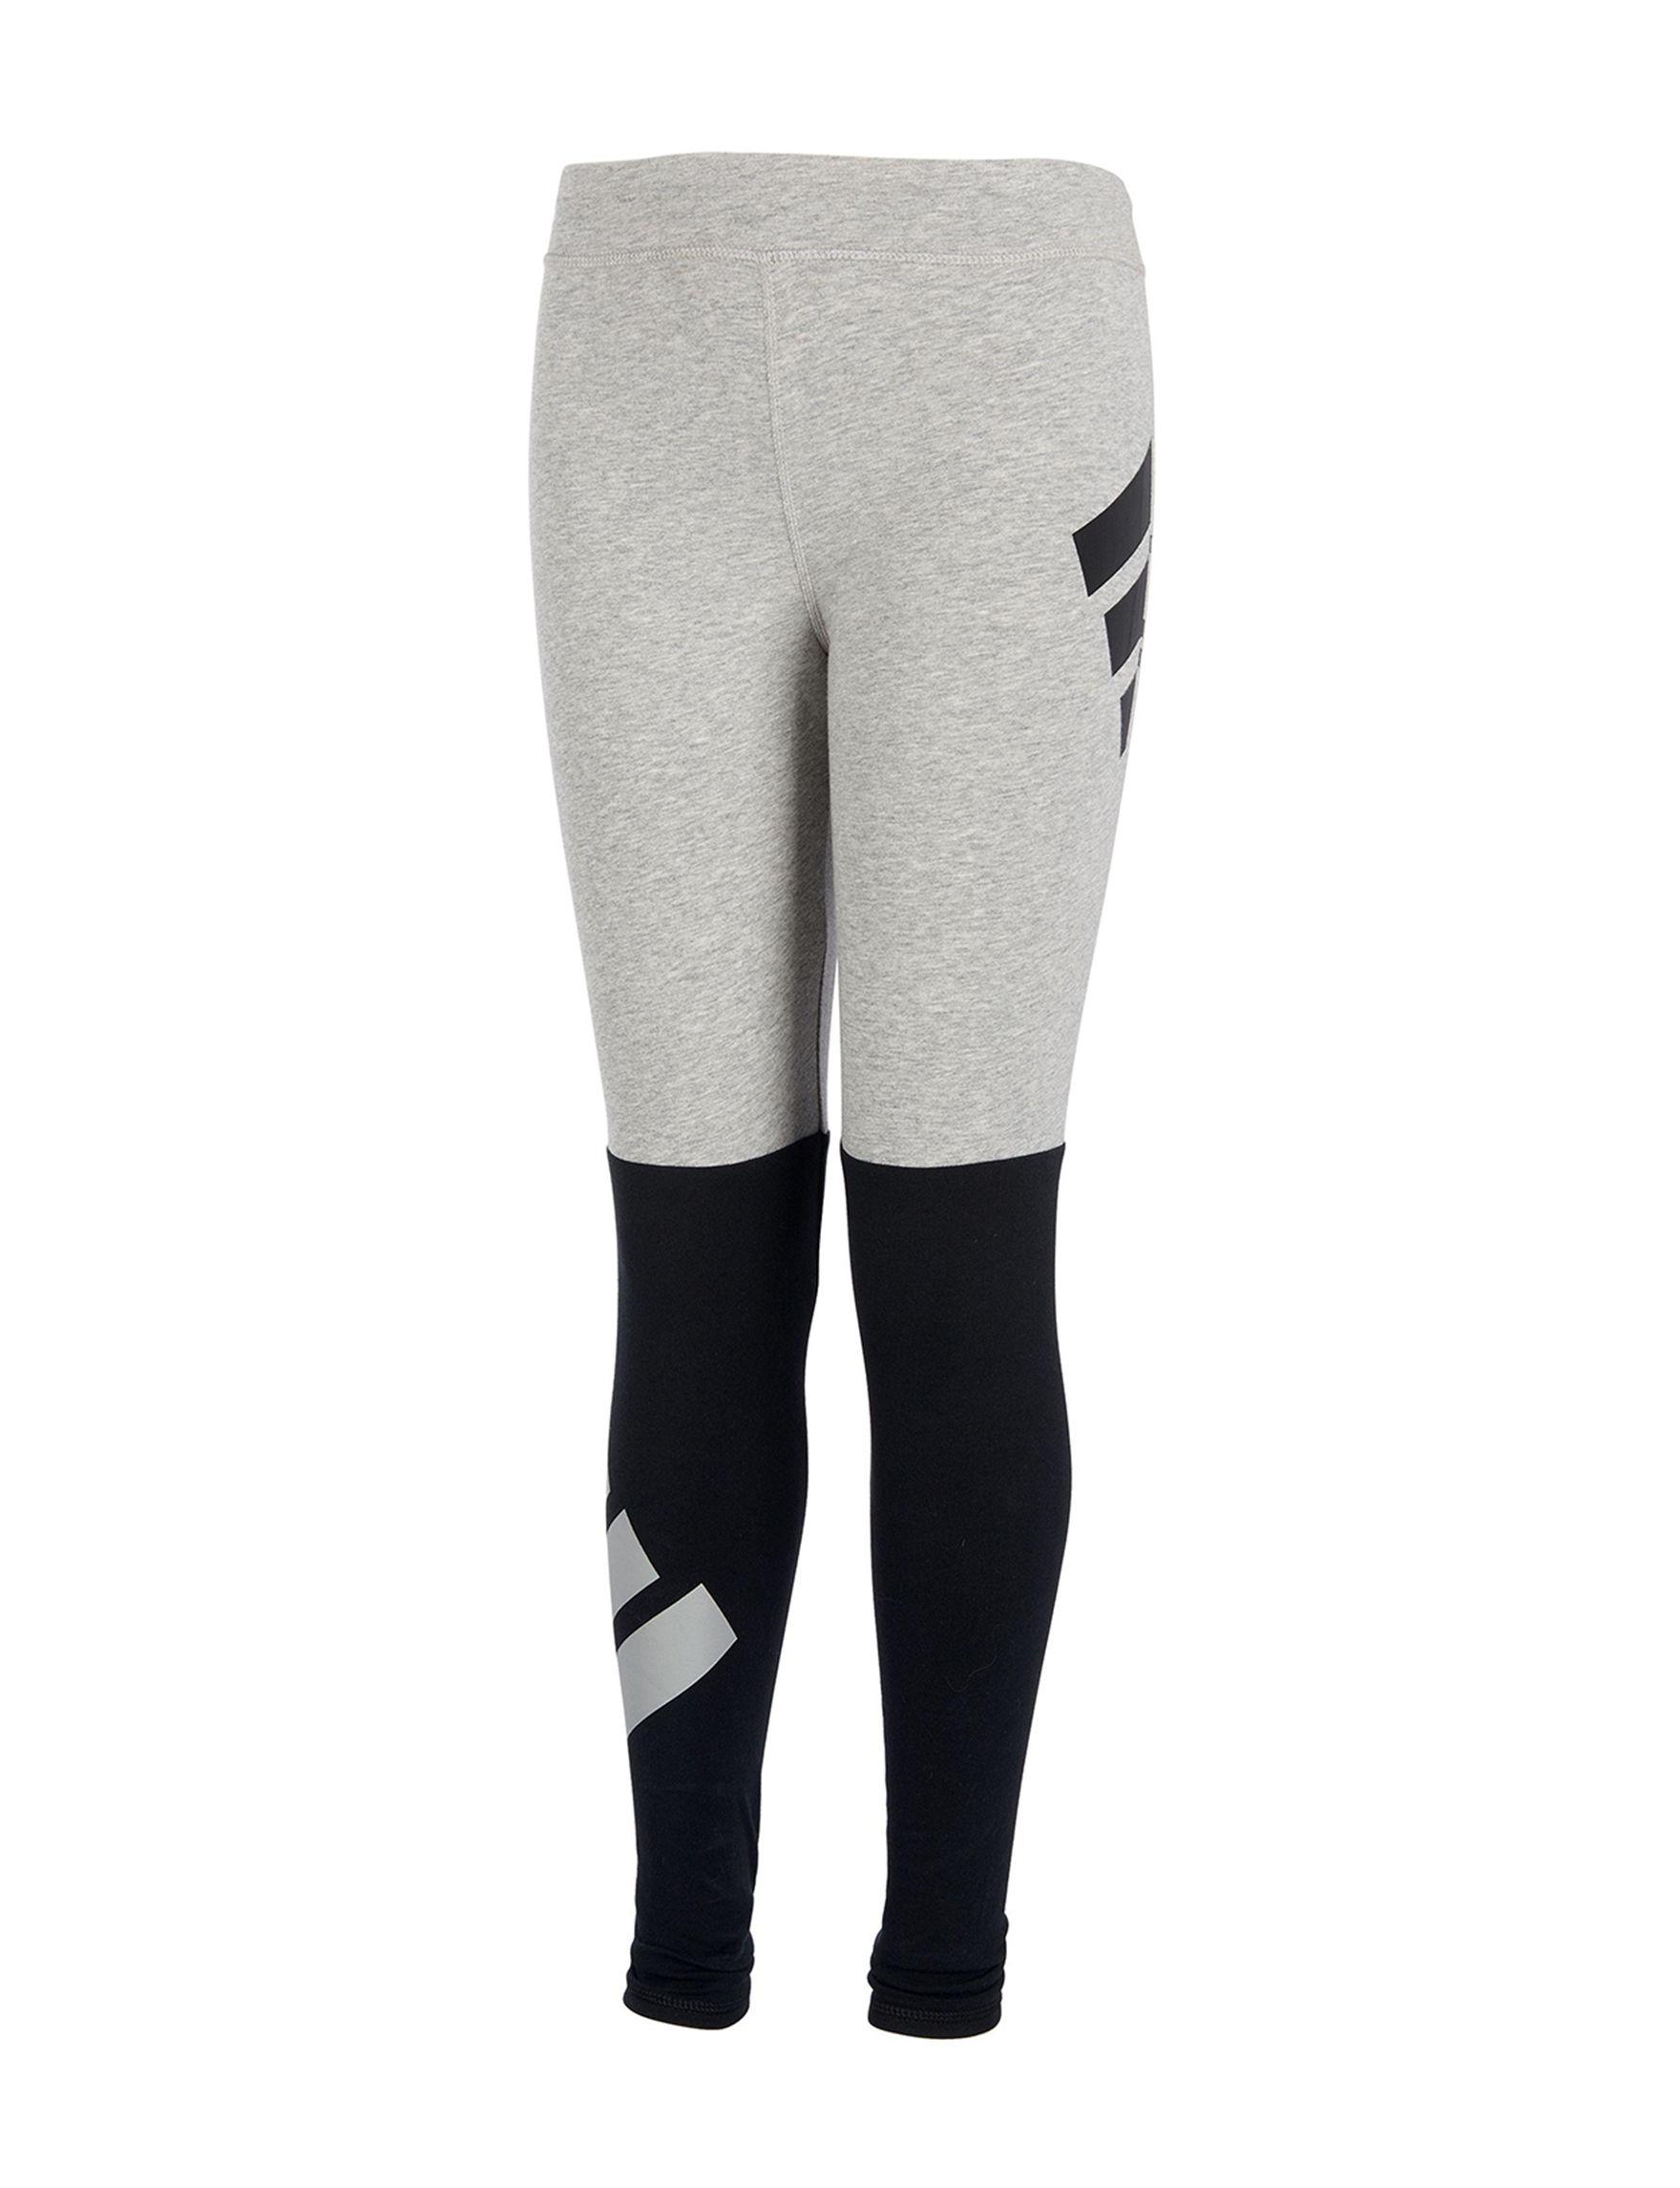 Adidas Heather Grey Leggings